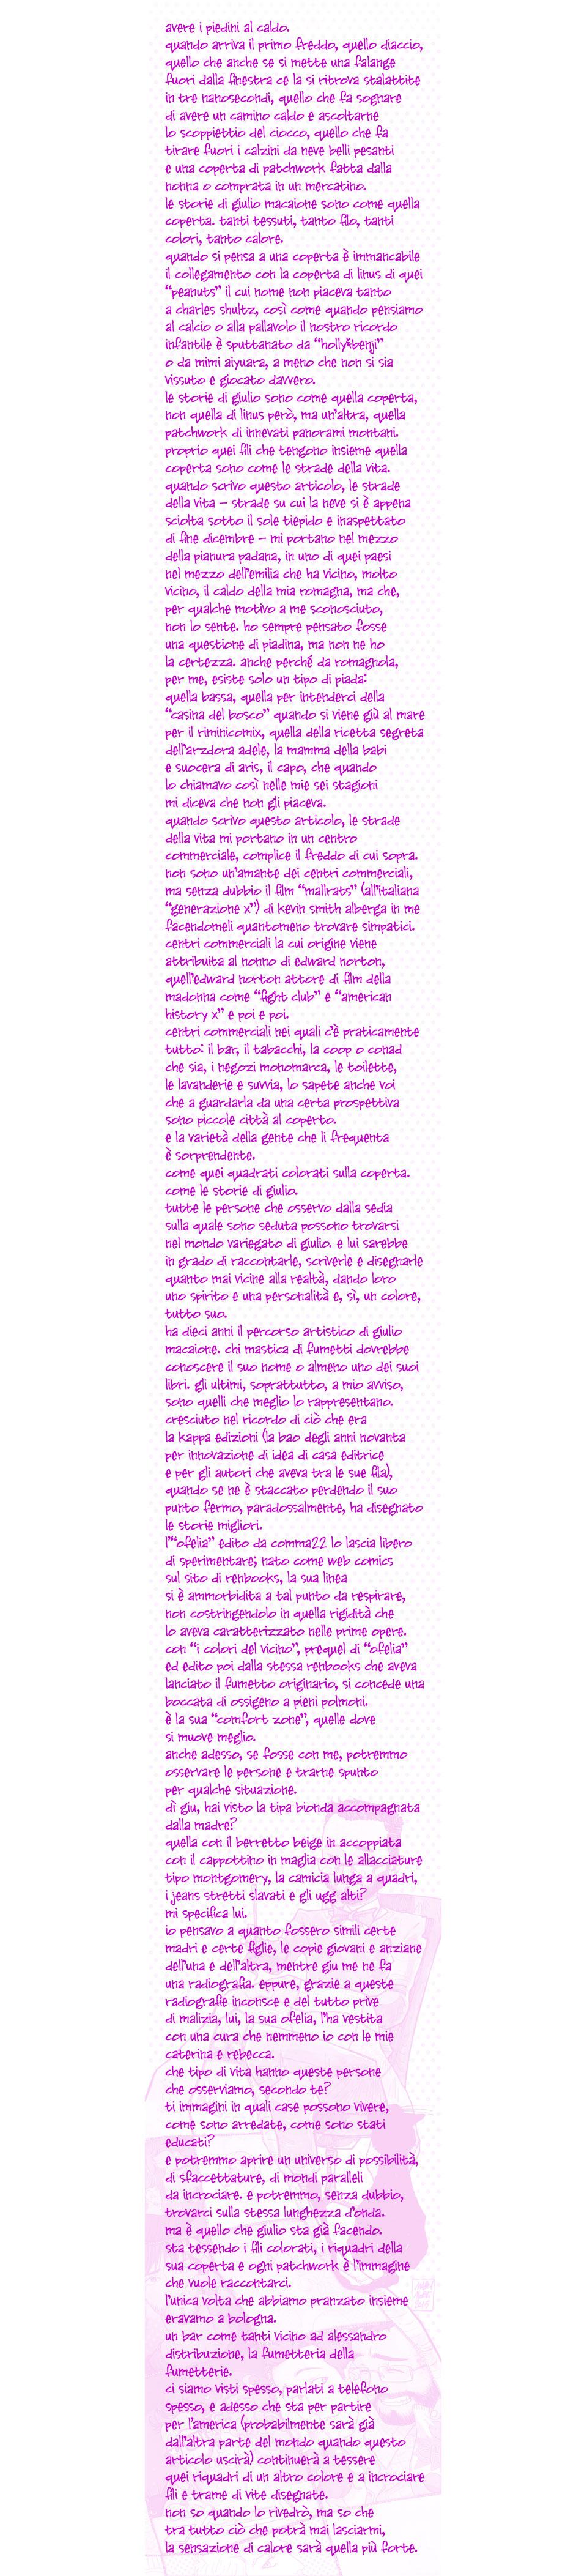 MabelMorriRacconta_GiulioMacaione2-960